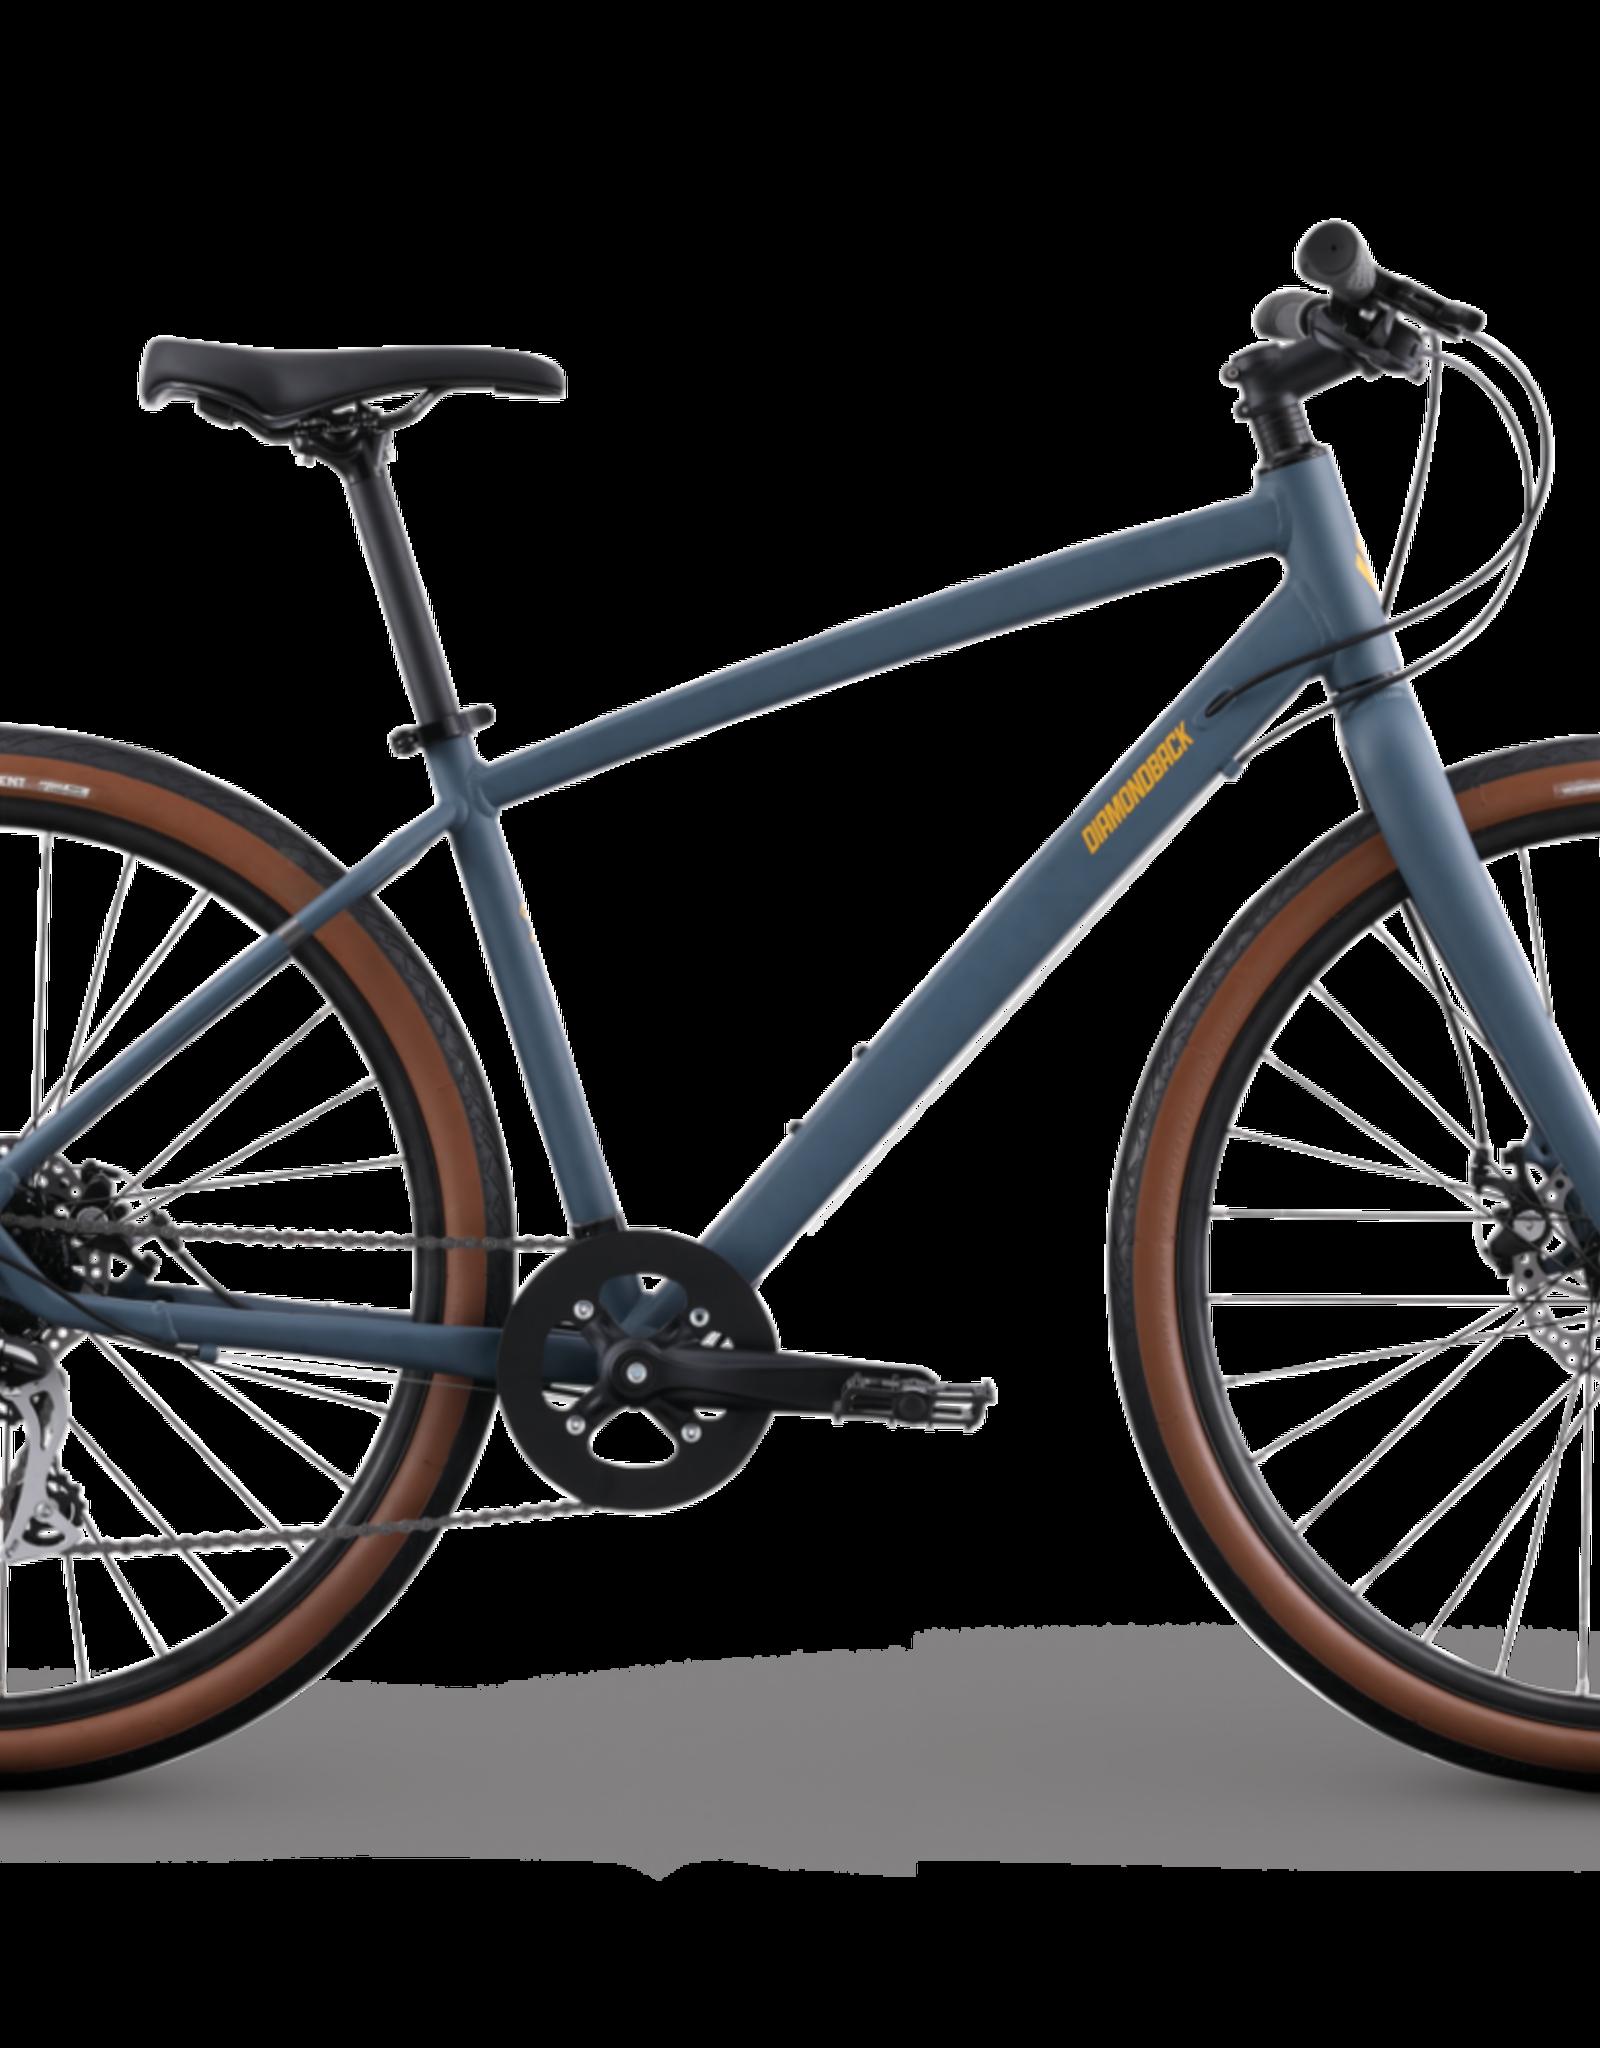 2021 Diamondback Division 1 Bicycle, Mechanical Disc